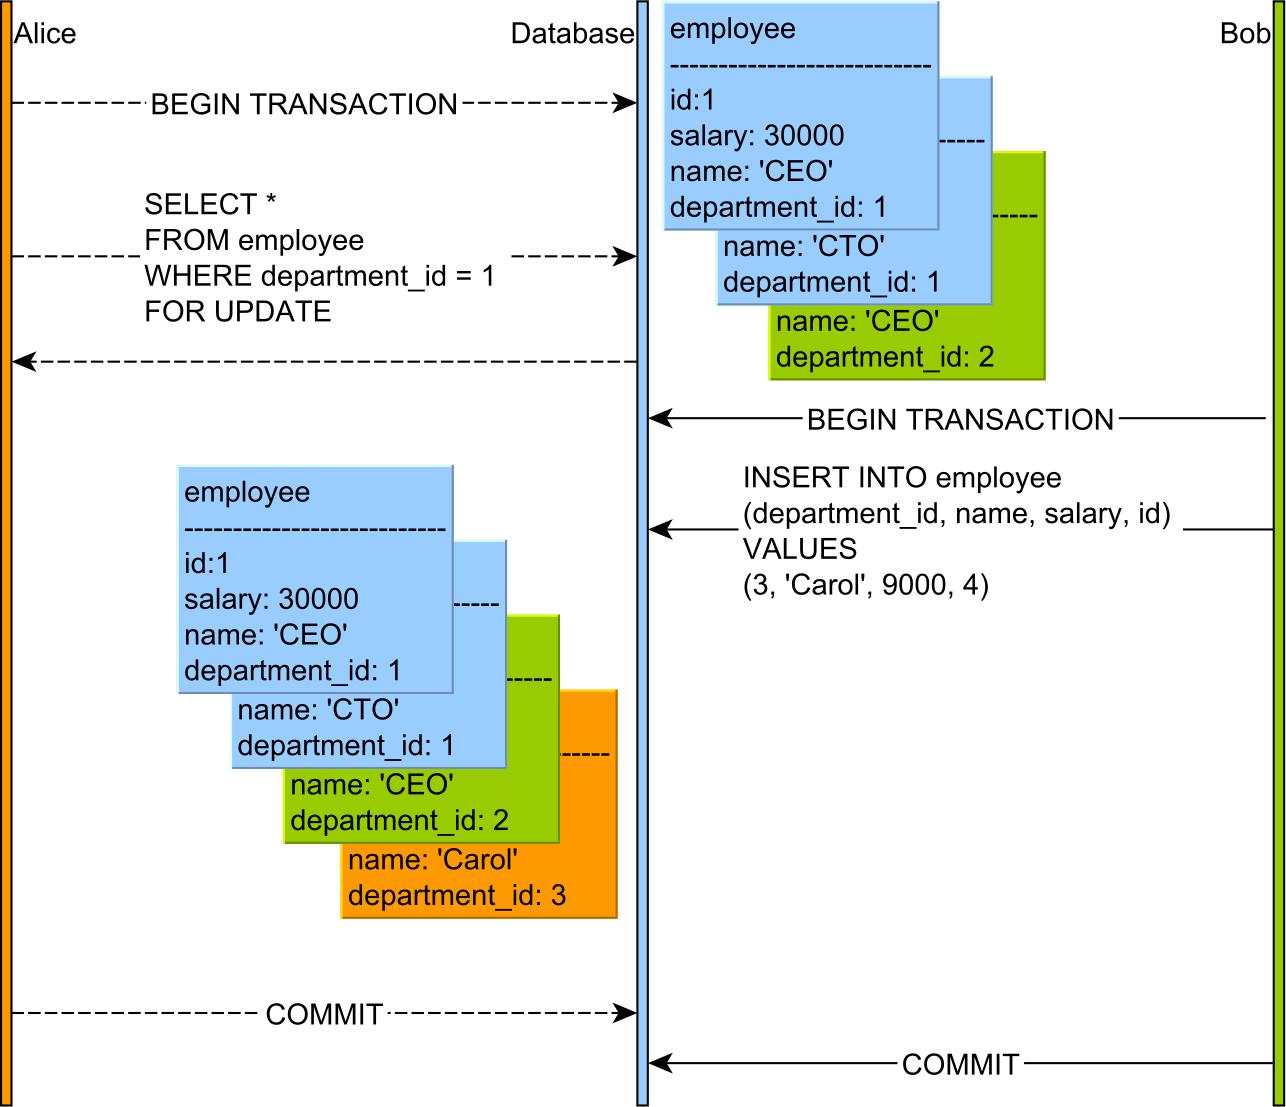 Table lock as predicate lock MySQL Department 1 and 3